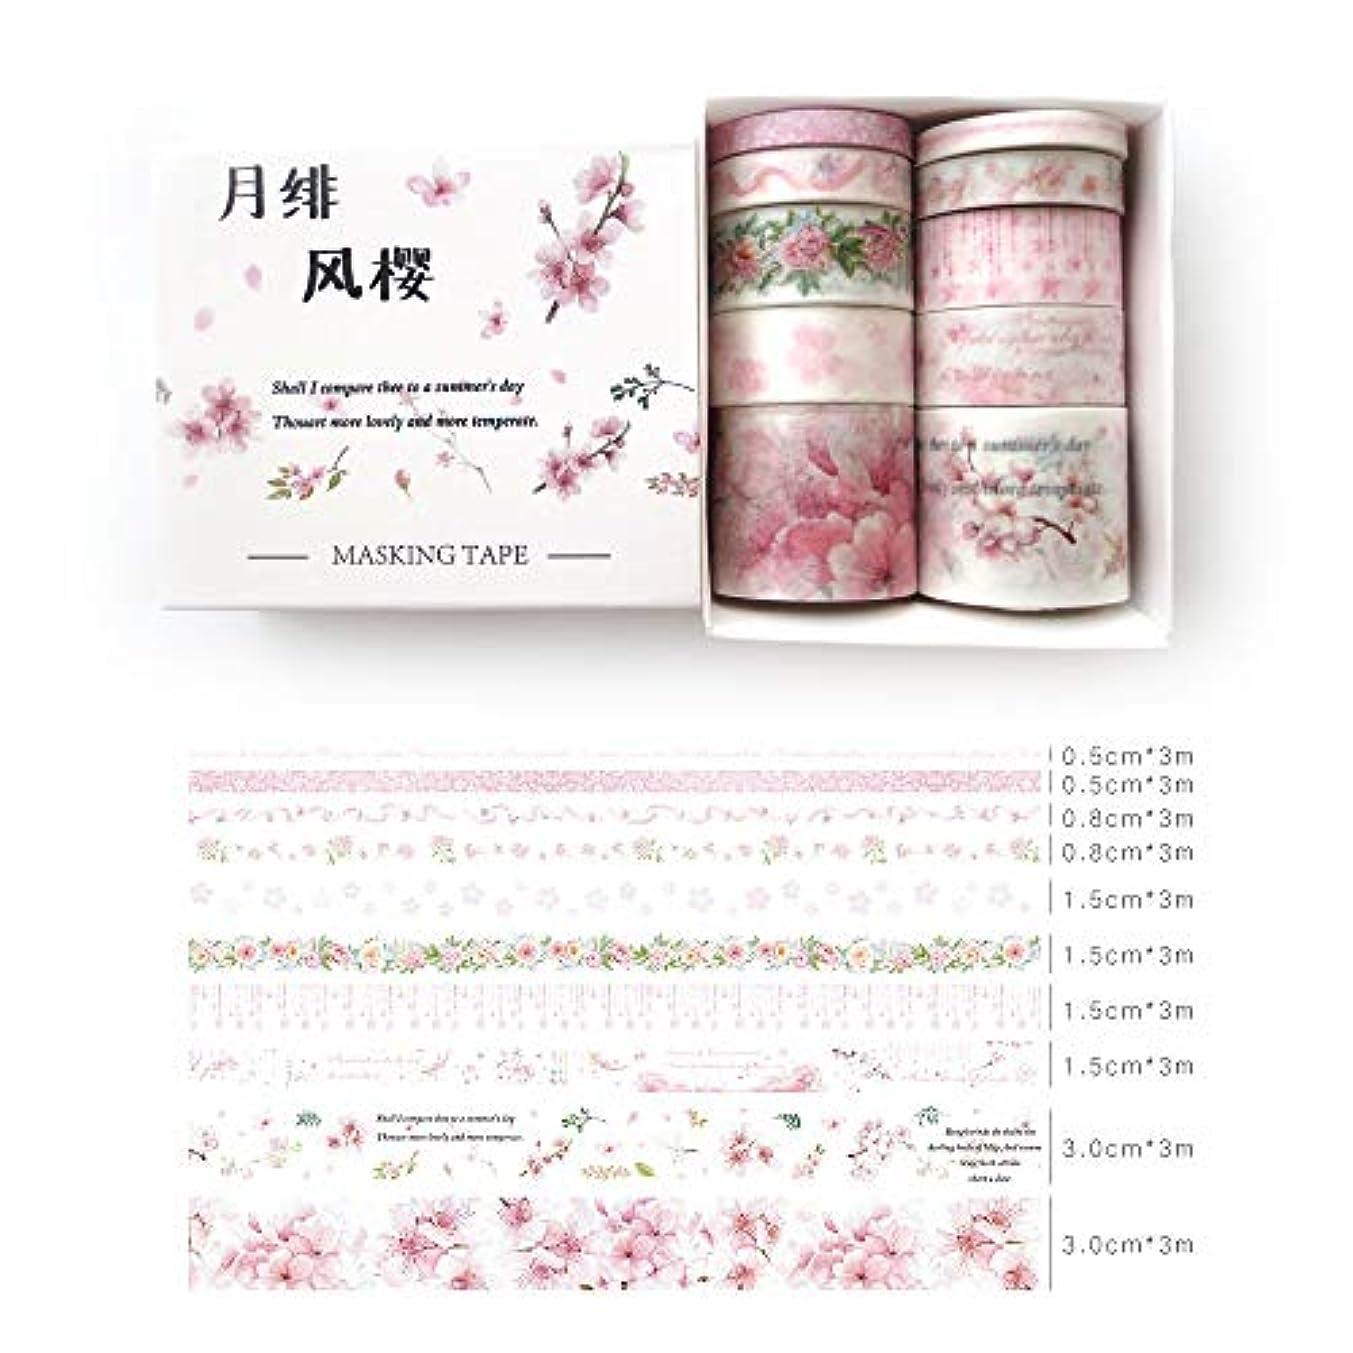 DzdzCrafts 10 Rolls Pink Blossom Flower Floral Decorative Washi Tapes Set for Scrapbooking Dairy Planner Album (0.5cm 0.8cm 1.5cm 3cm Wide x 3M Each)